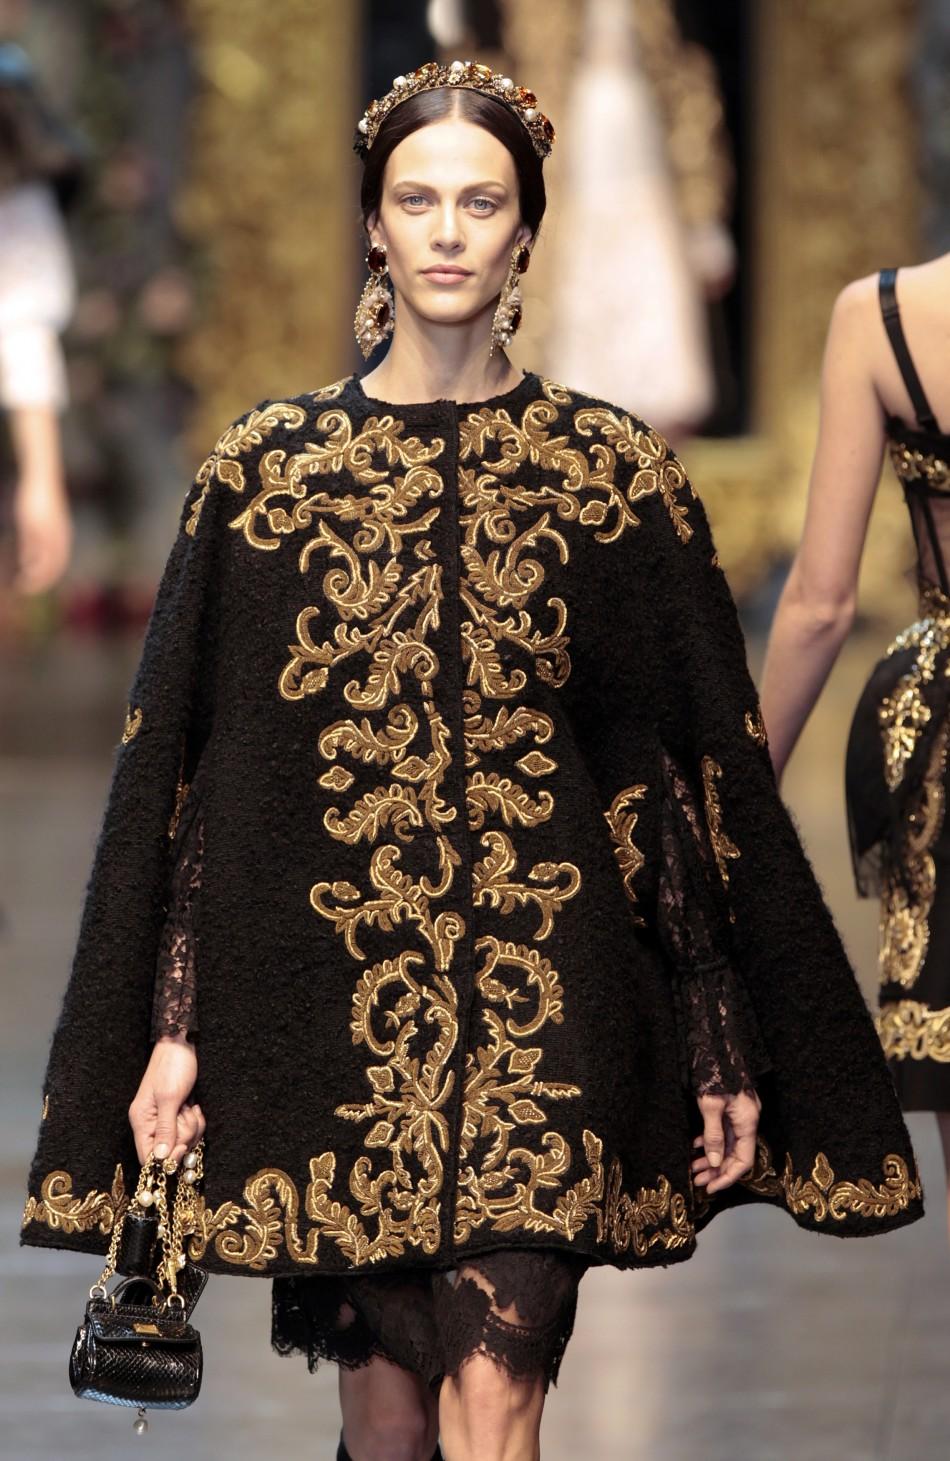 2012 Fall 2013 Winter Nail Polish Trends: EVERYDAY IS A CATWALK: Dolce & Gabbana, Milan Fashion Week